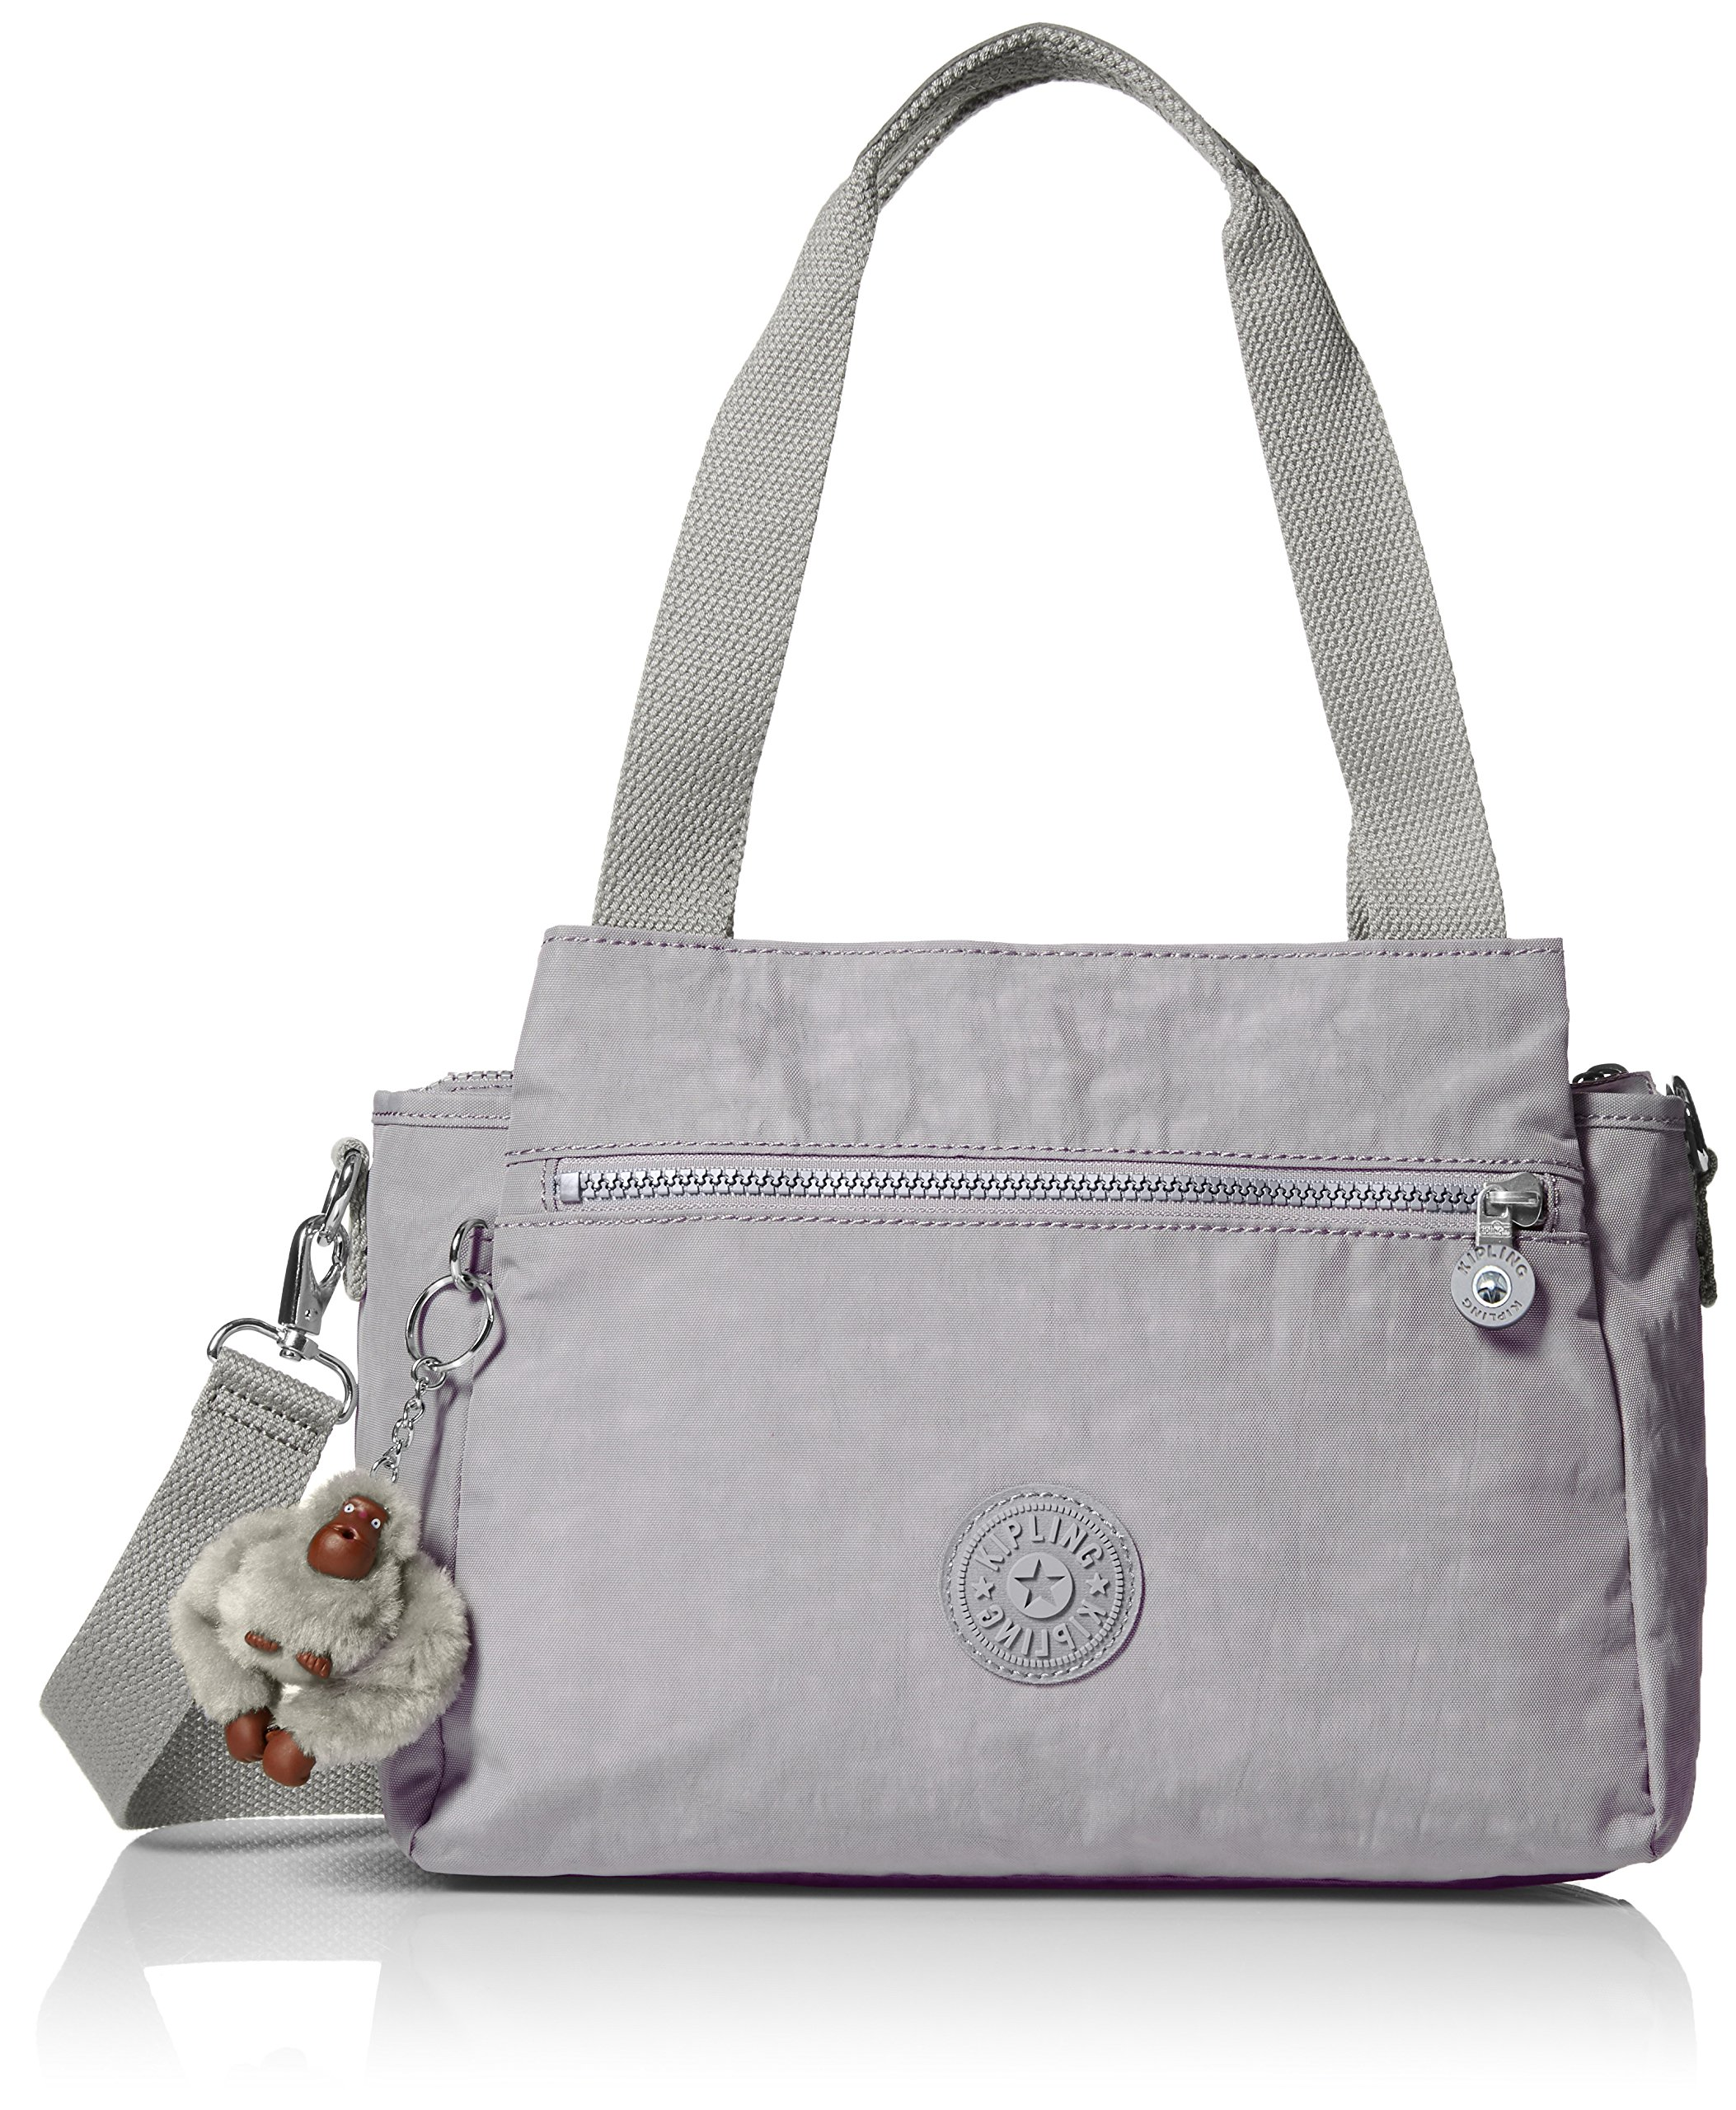 Kipling Elysia Slate Grey Tonal Handbag t